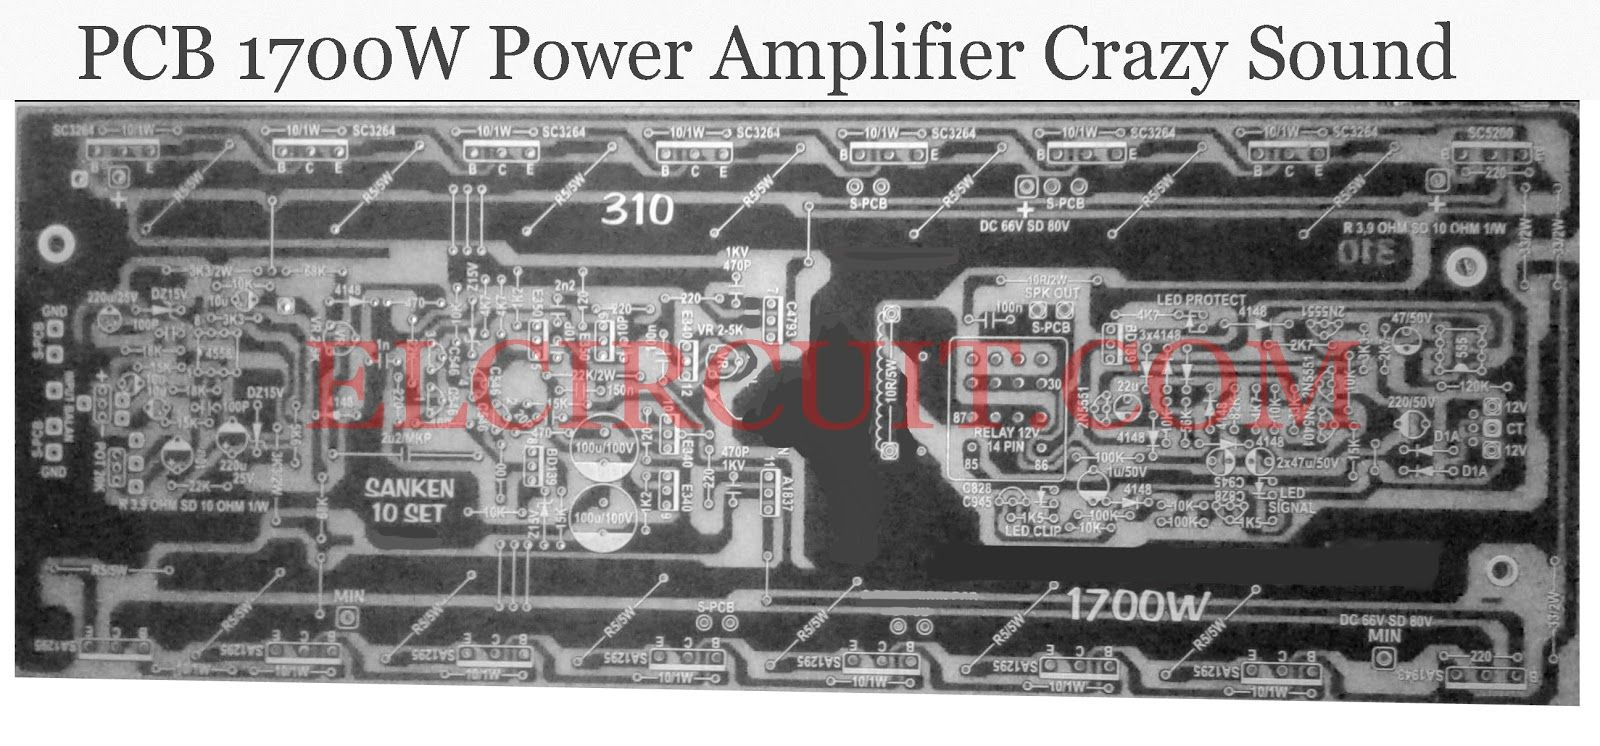 Crazy Sound 1700w Power Amplifier Circuit Technology Audio Diagram Pcb